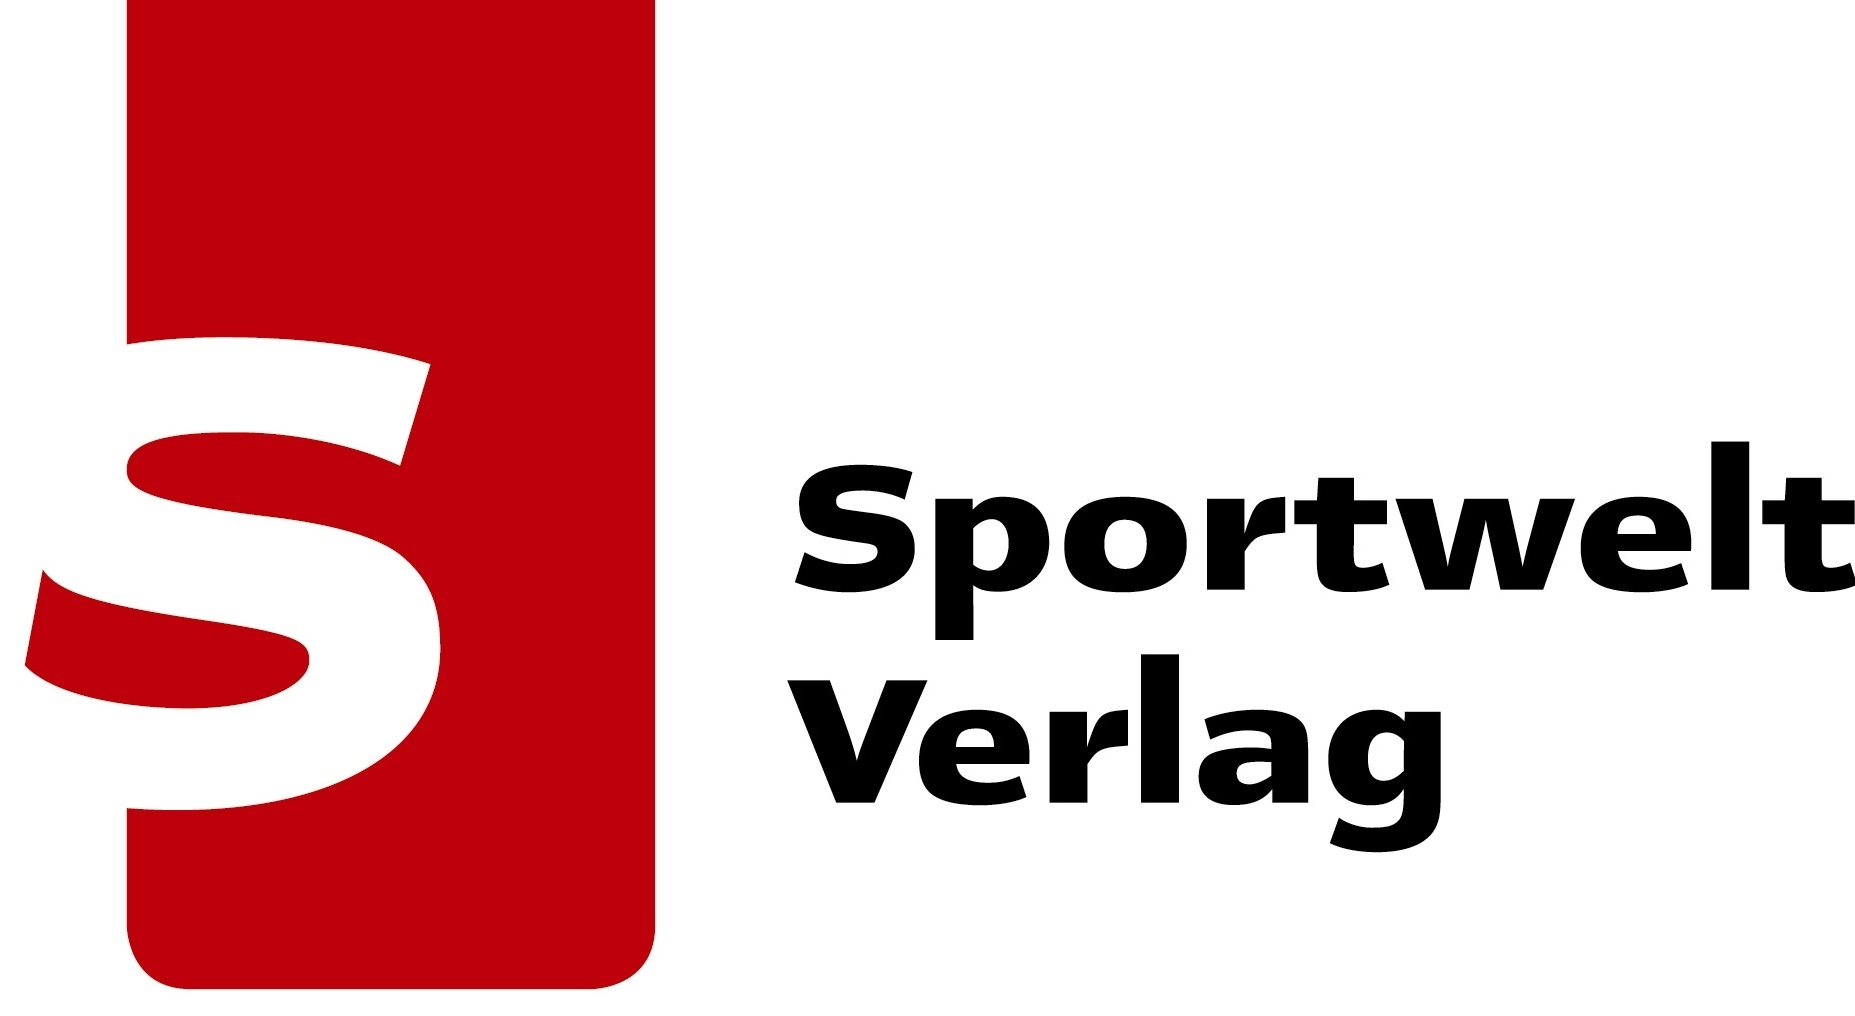 Sportwelt Verlag